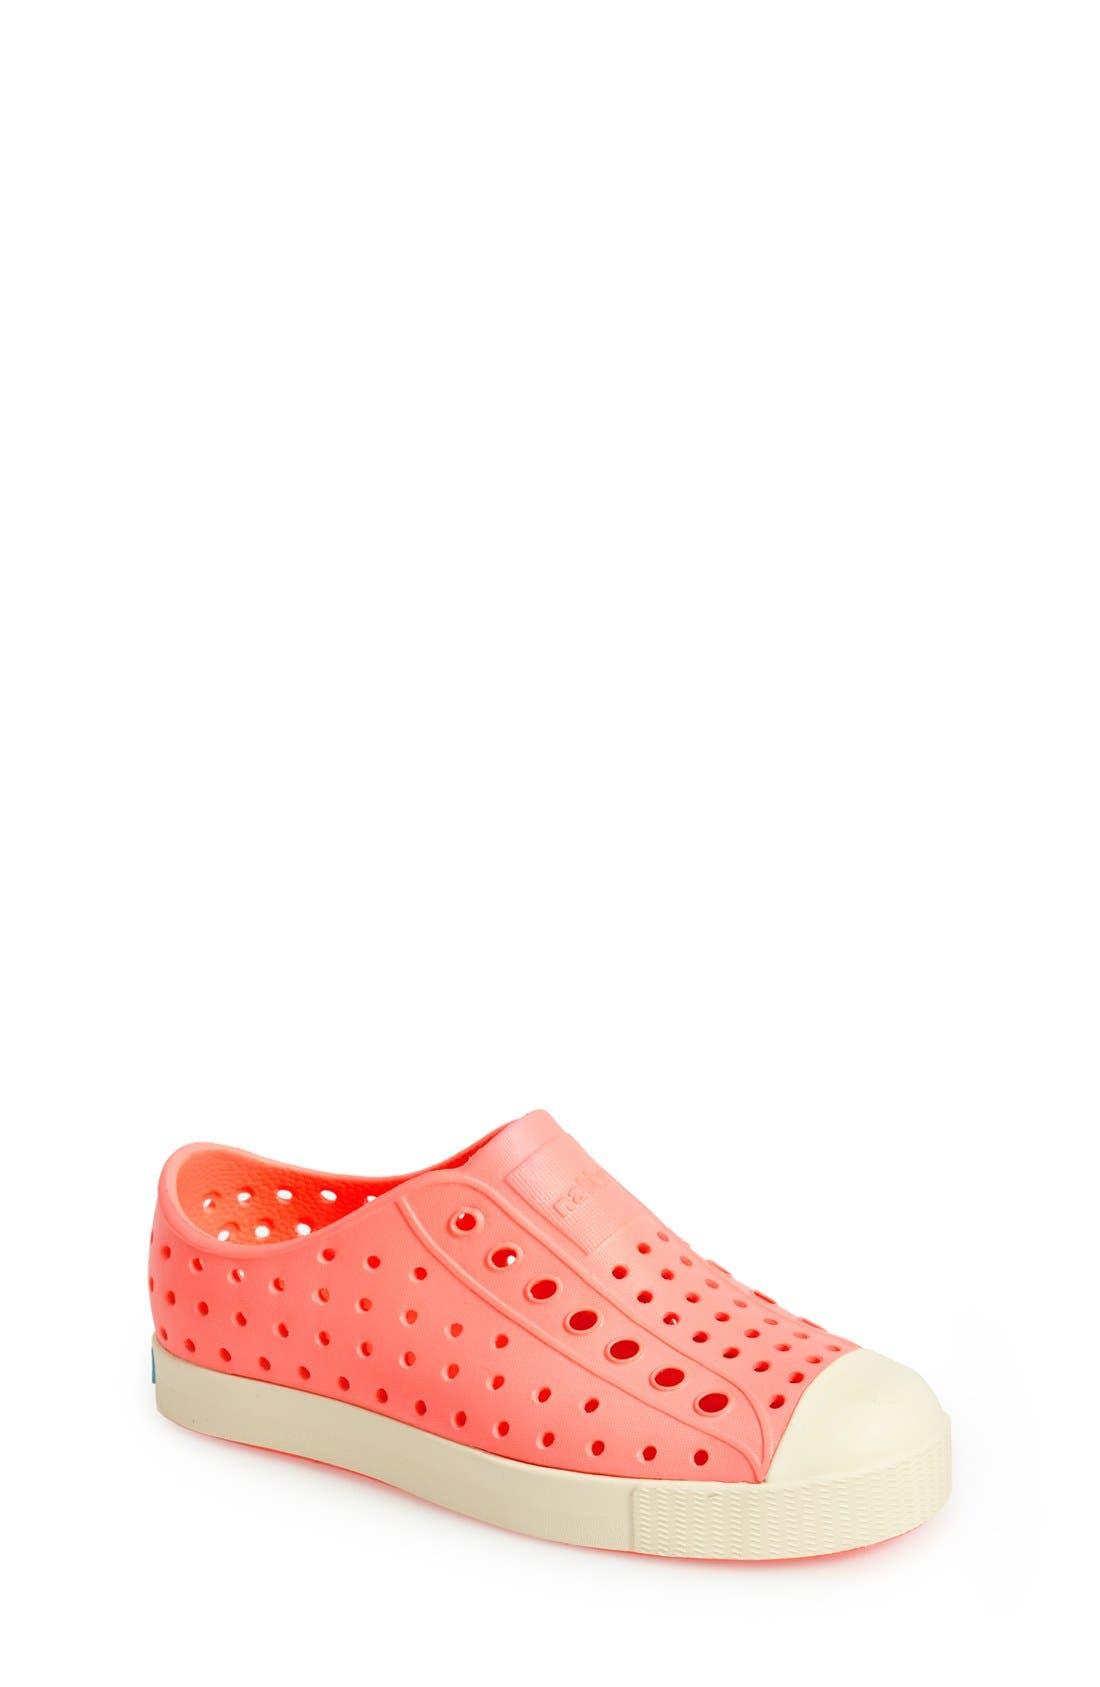 'Jefferson' Water Friendly Slip-On Sneaker,                             Main thumbnail 64, color,